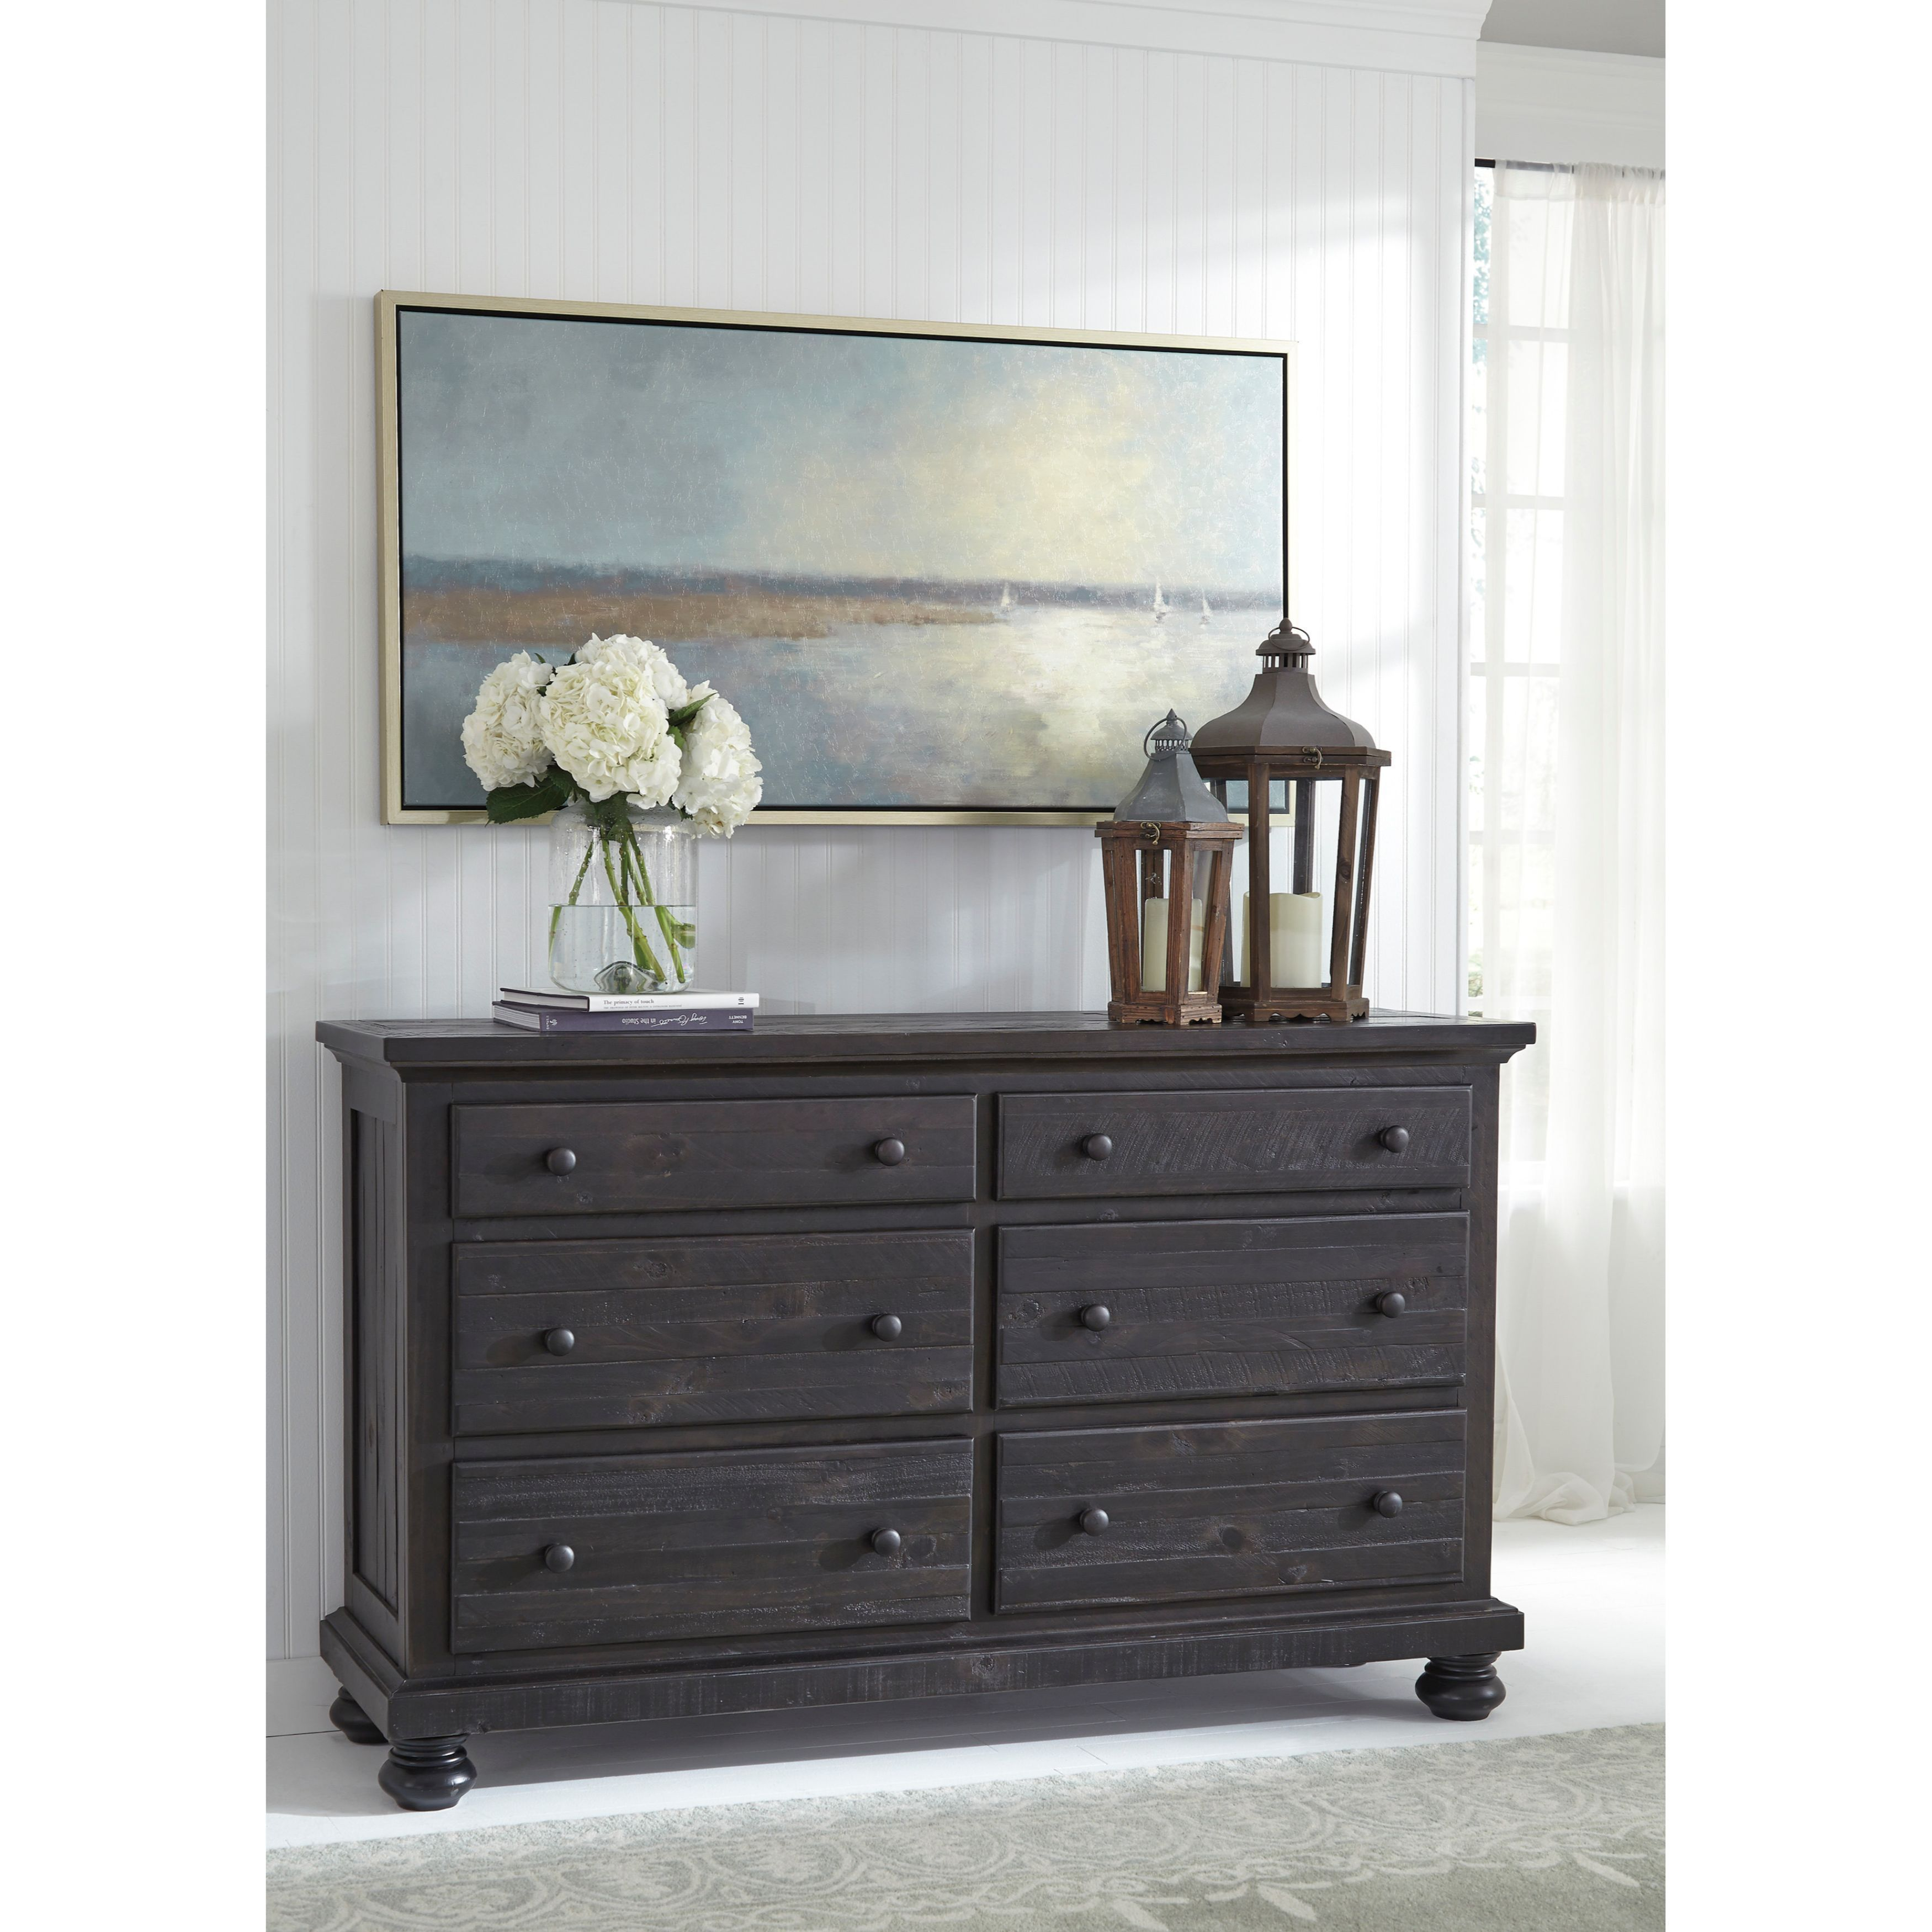 Signature Design By Ashley Sharlowe Charcoal Dresser Furniture Charcoal Bedroom Furniture Home Decor [ 3500 x 3500 Pixel ]